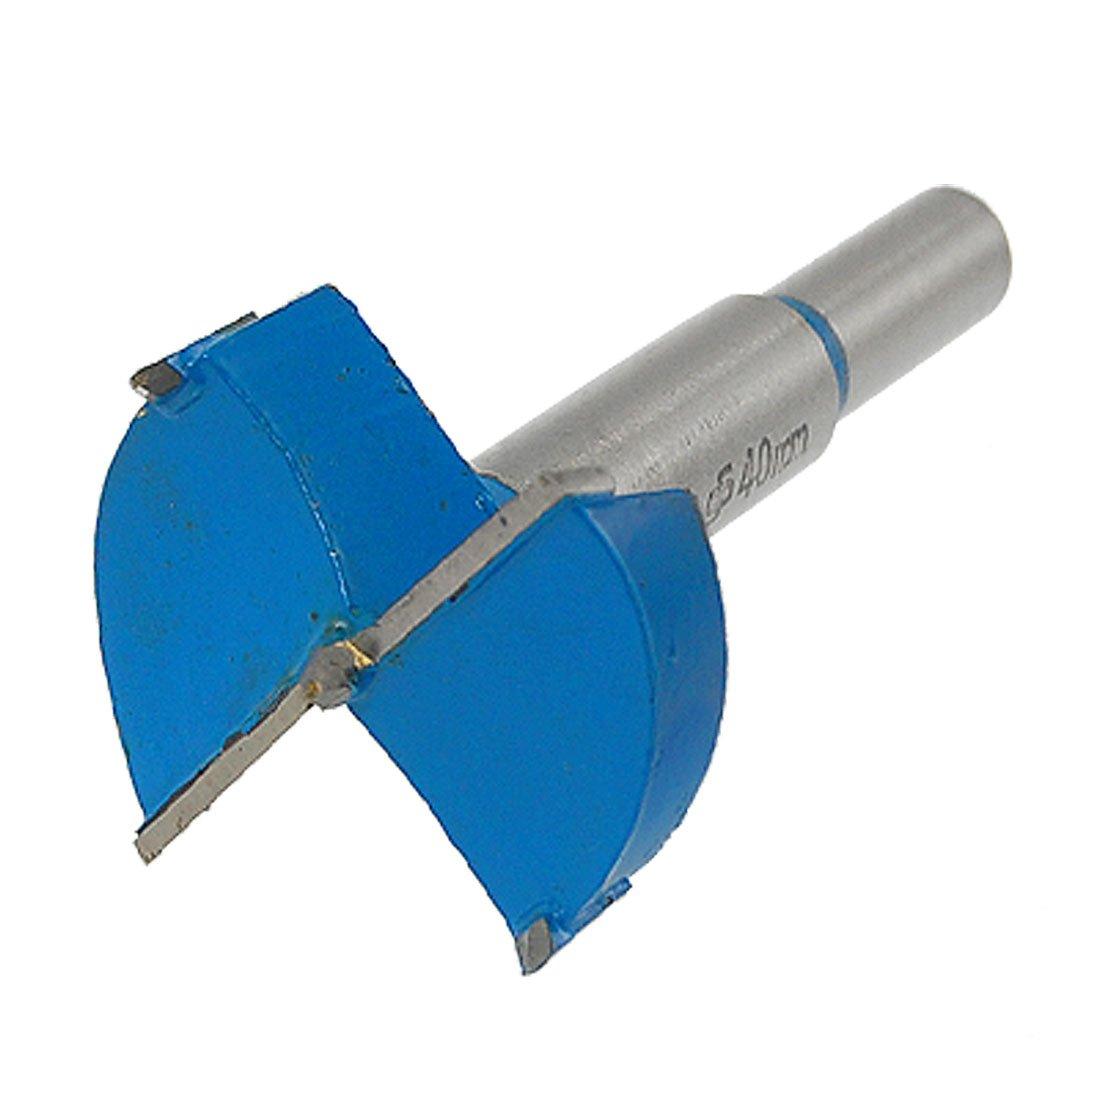 uxcell a11032300ux0165 9.5mm Shank 40mm Cutting Diameter Hinge Boring Drill Bit